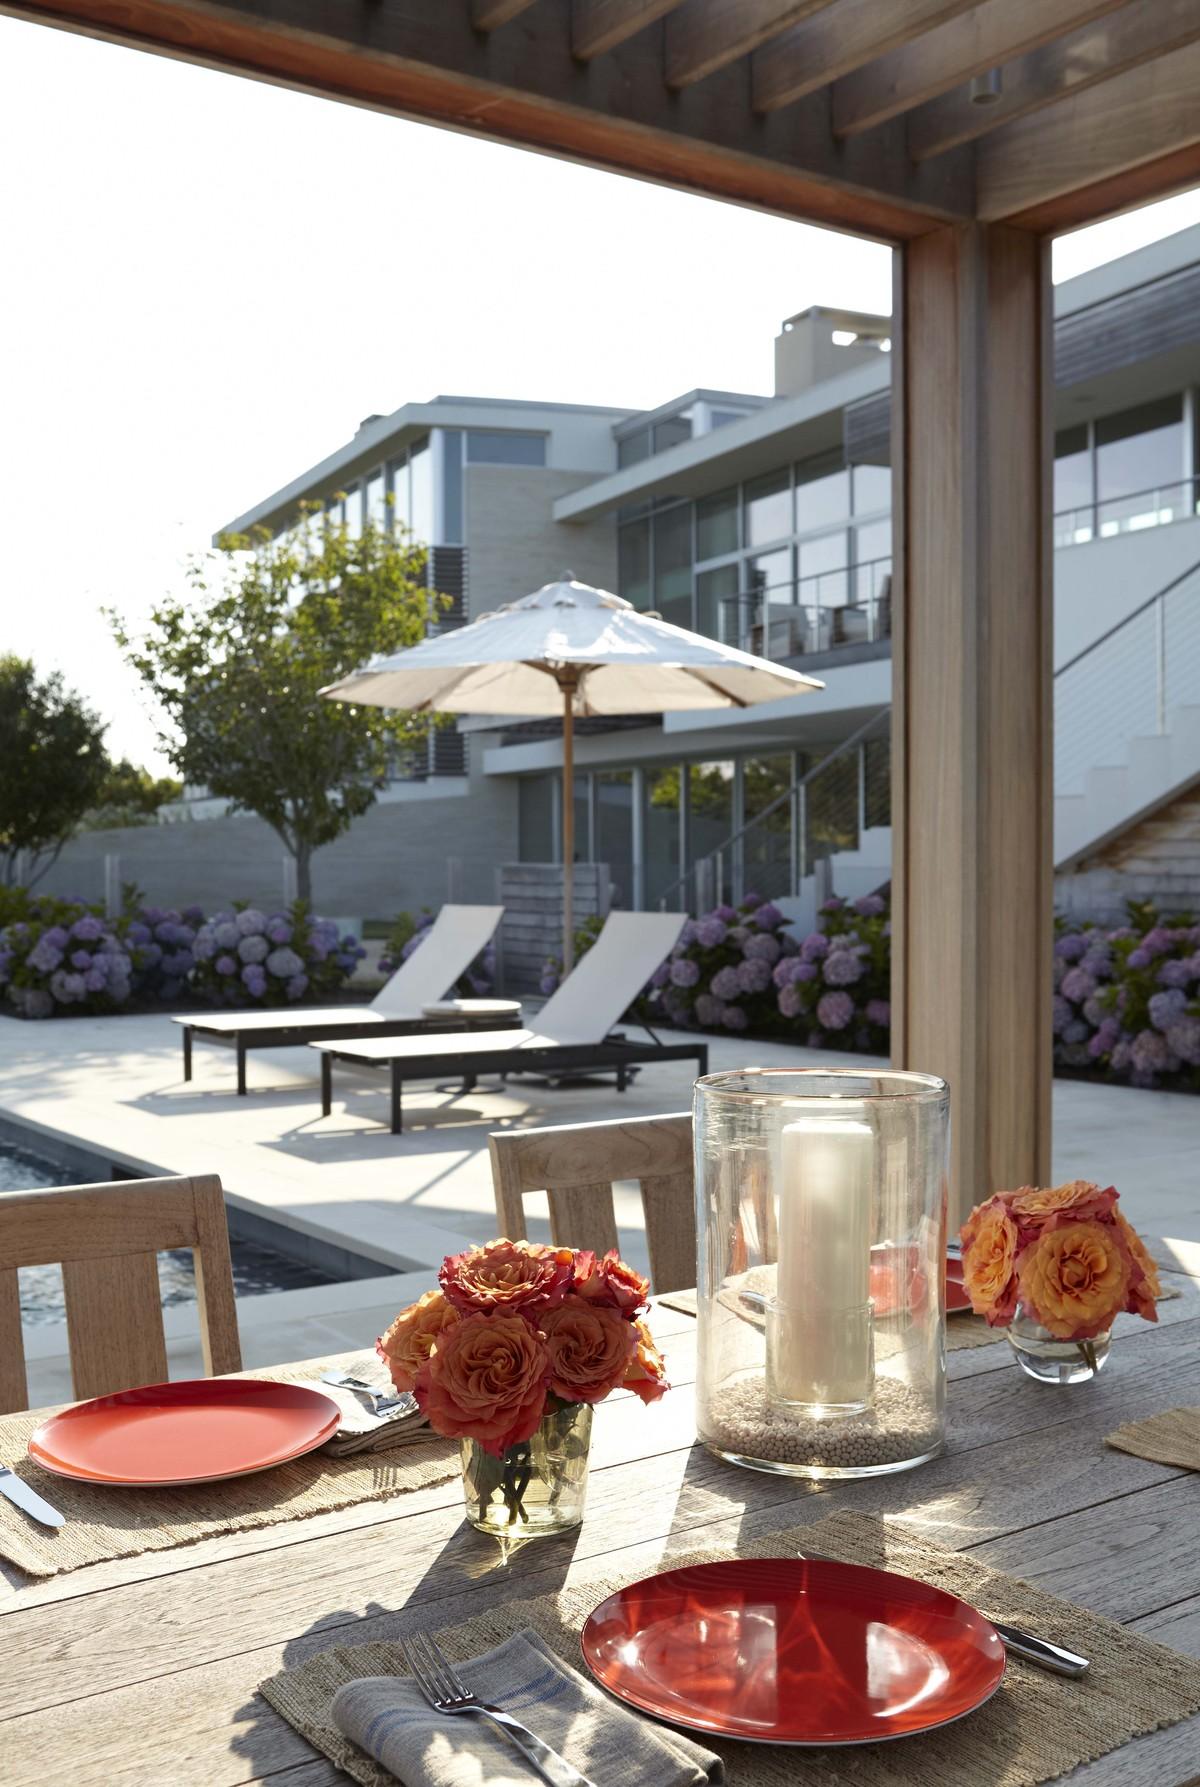 Patio dining area, poolside